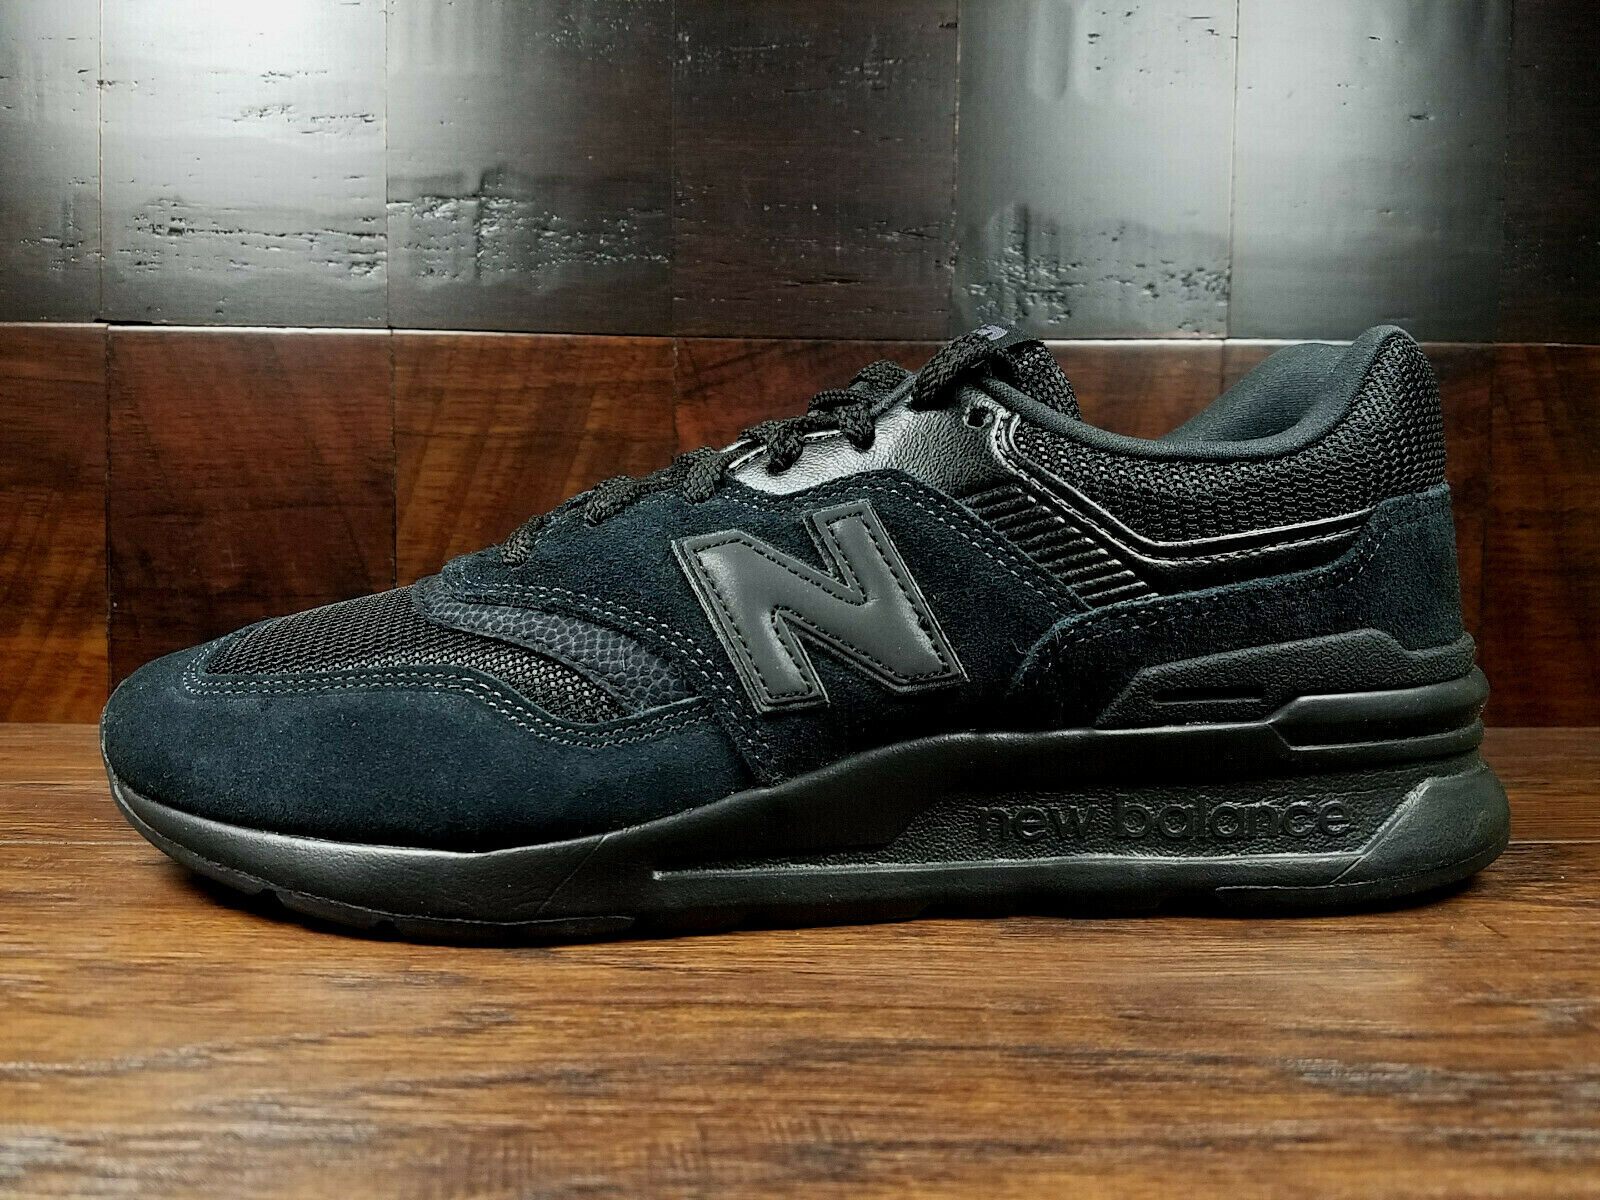 new balance cm997hci black